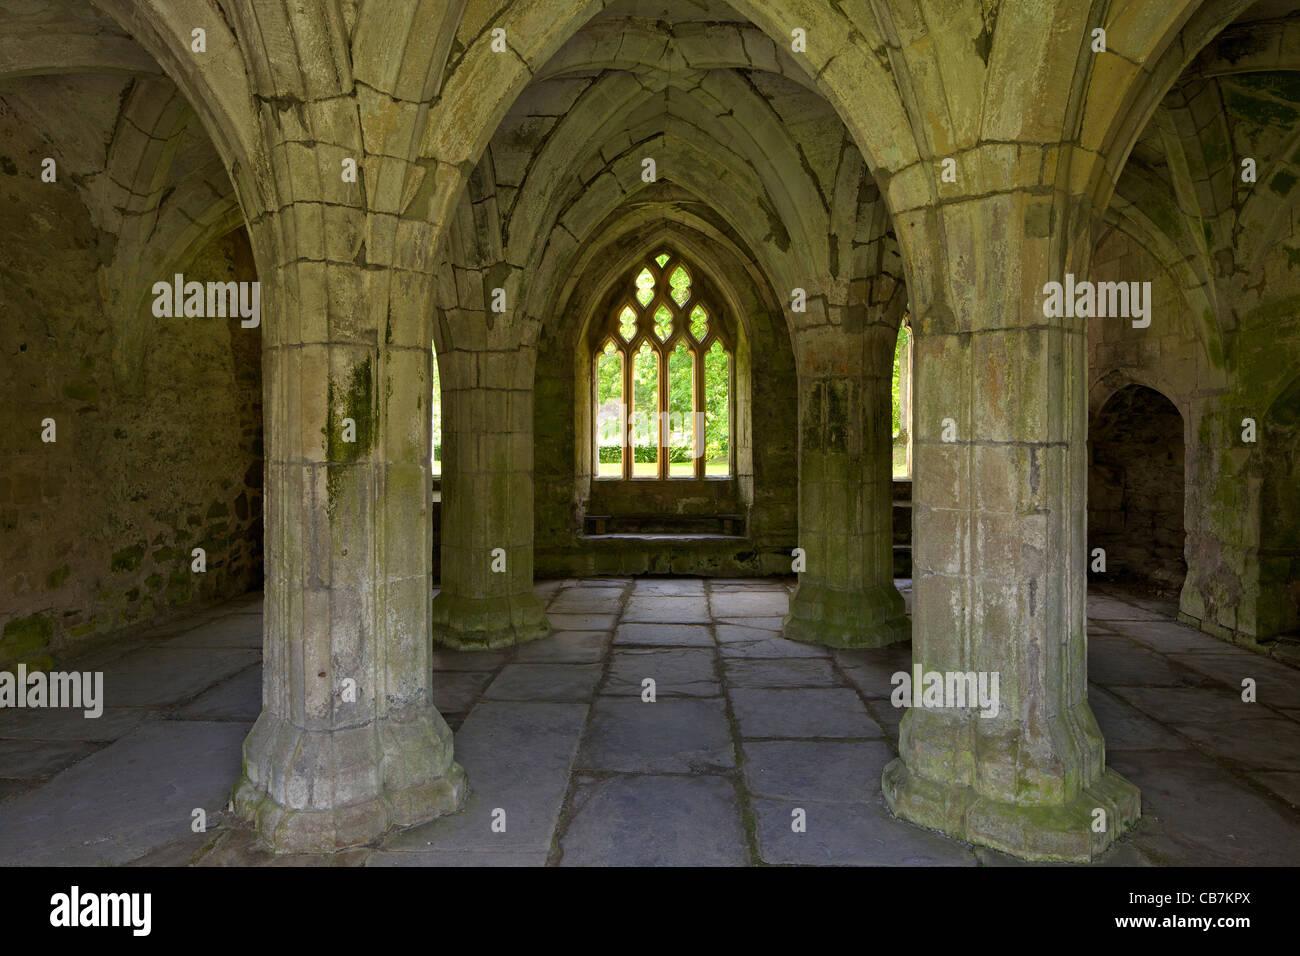 Vaulted Chapter House at Valle Crucis in Llantysilio, near Llangollen, Wales, Cymru, UK, United Kingdom, Stock Photo